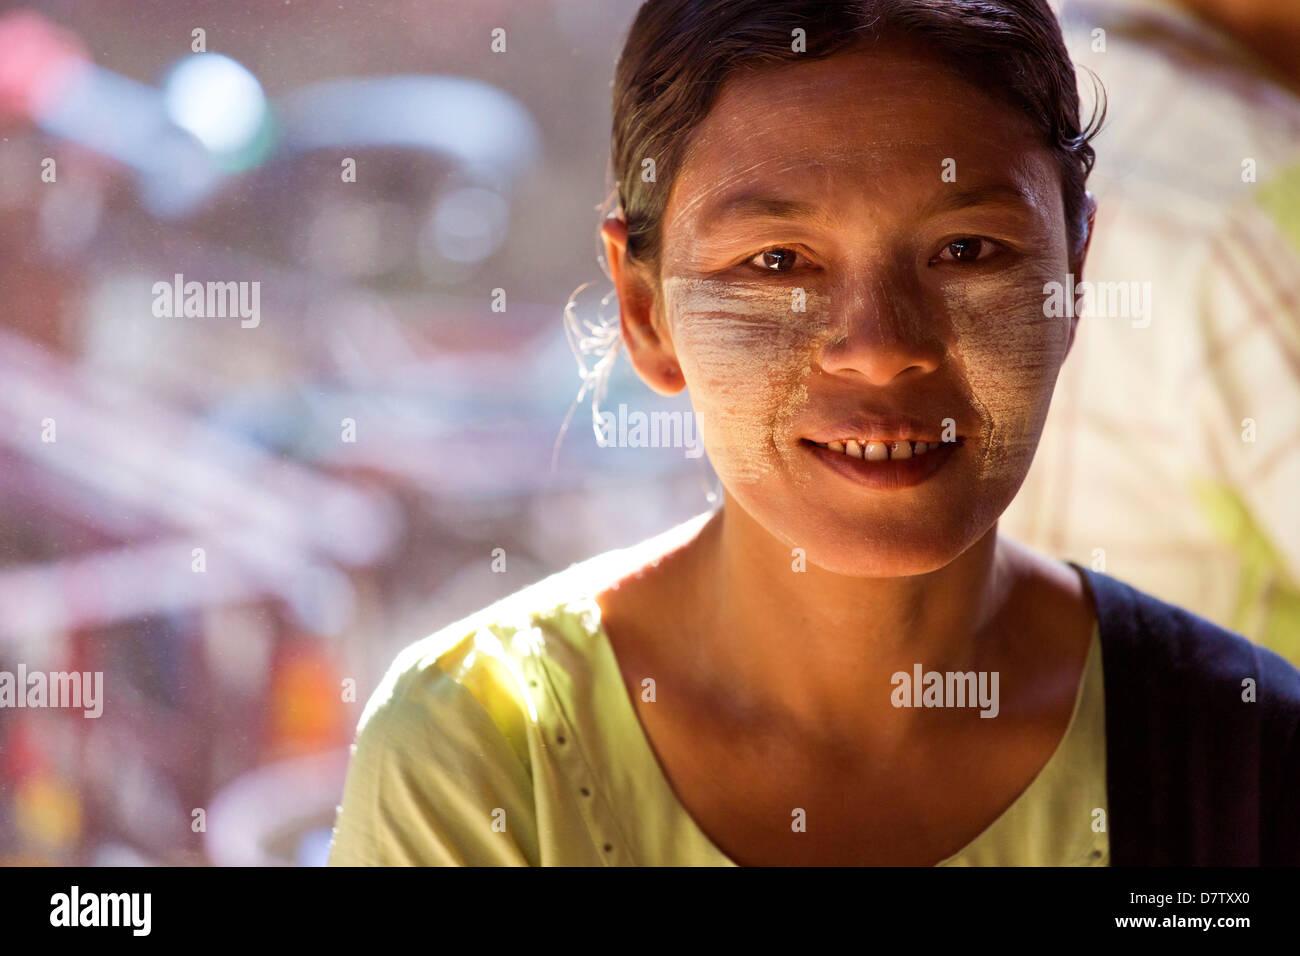 Femme avec Thanakha visage traditionnel peinture, Thiri Mingalar, marché de Yangon (Rangoon), la Birmanie Photo Stock